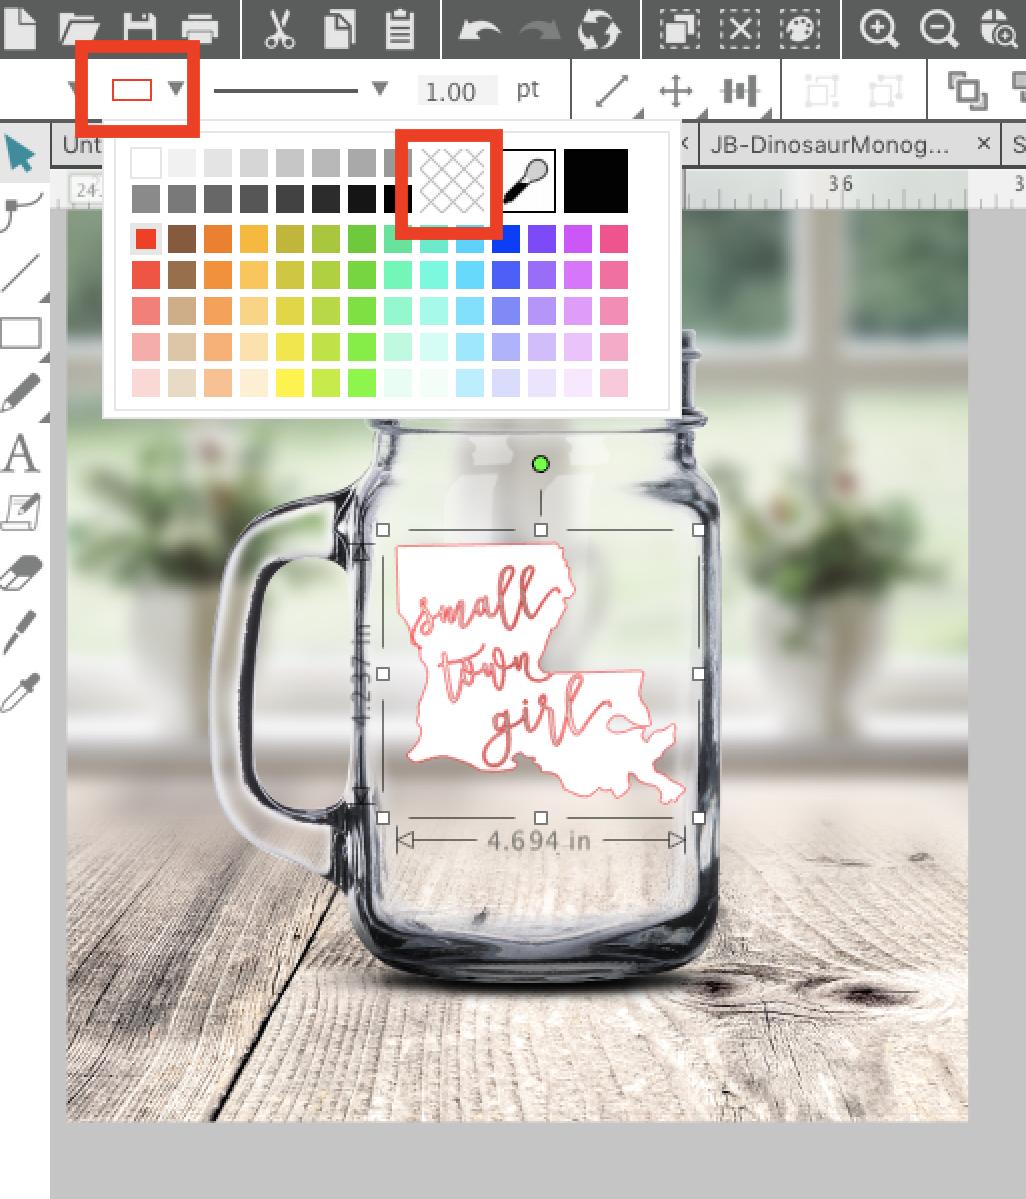 how to make mock ups in inkscape